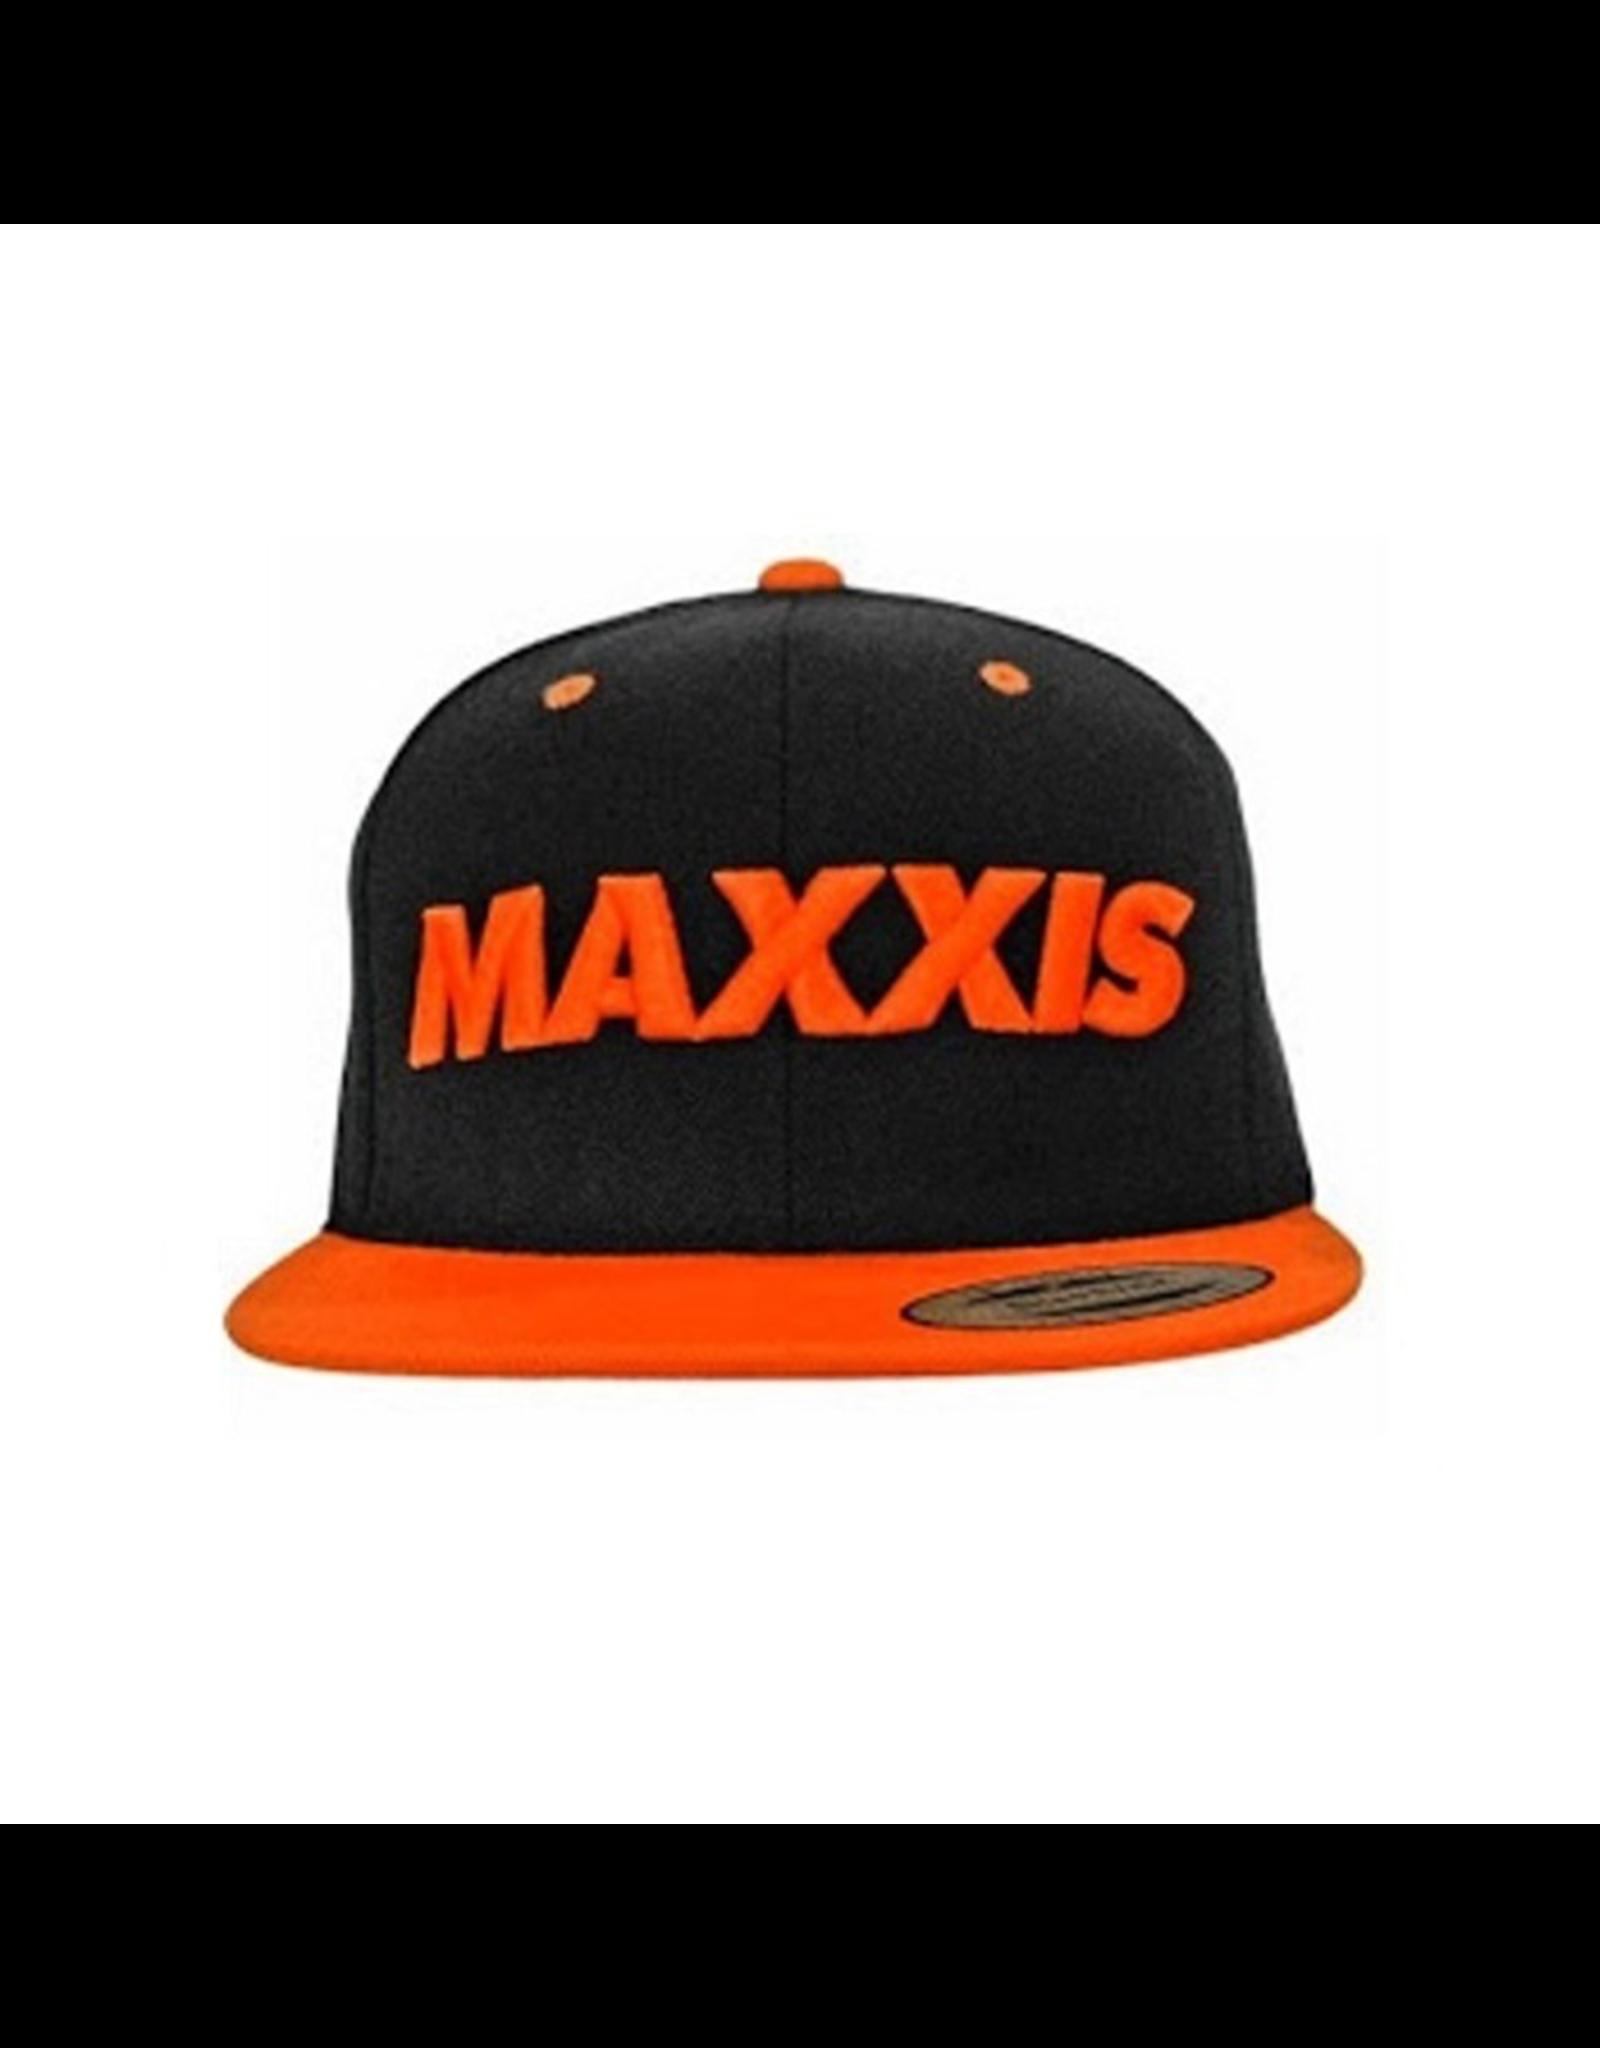 MAXXIS MAXXIS SNAPBACK HAT BLACK/ORANGE